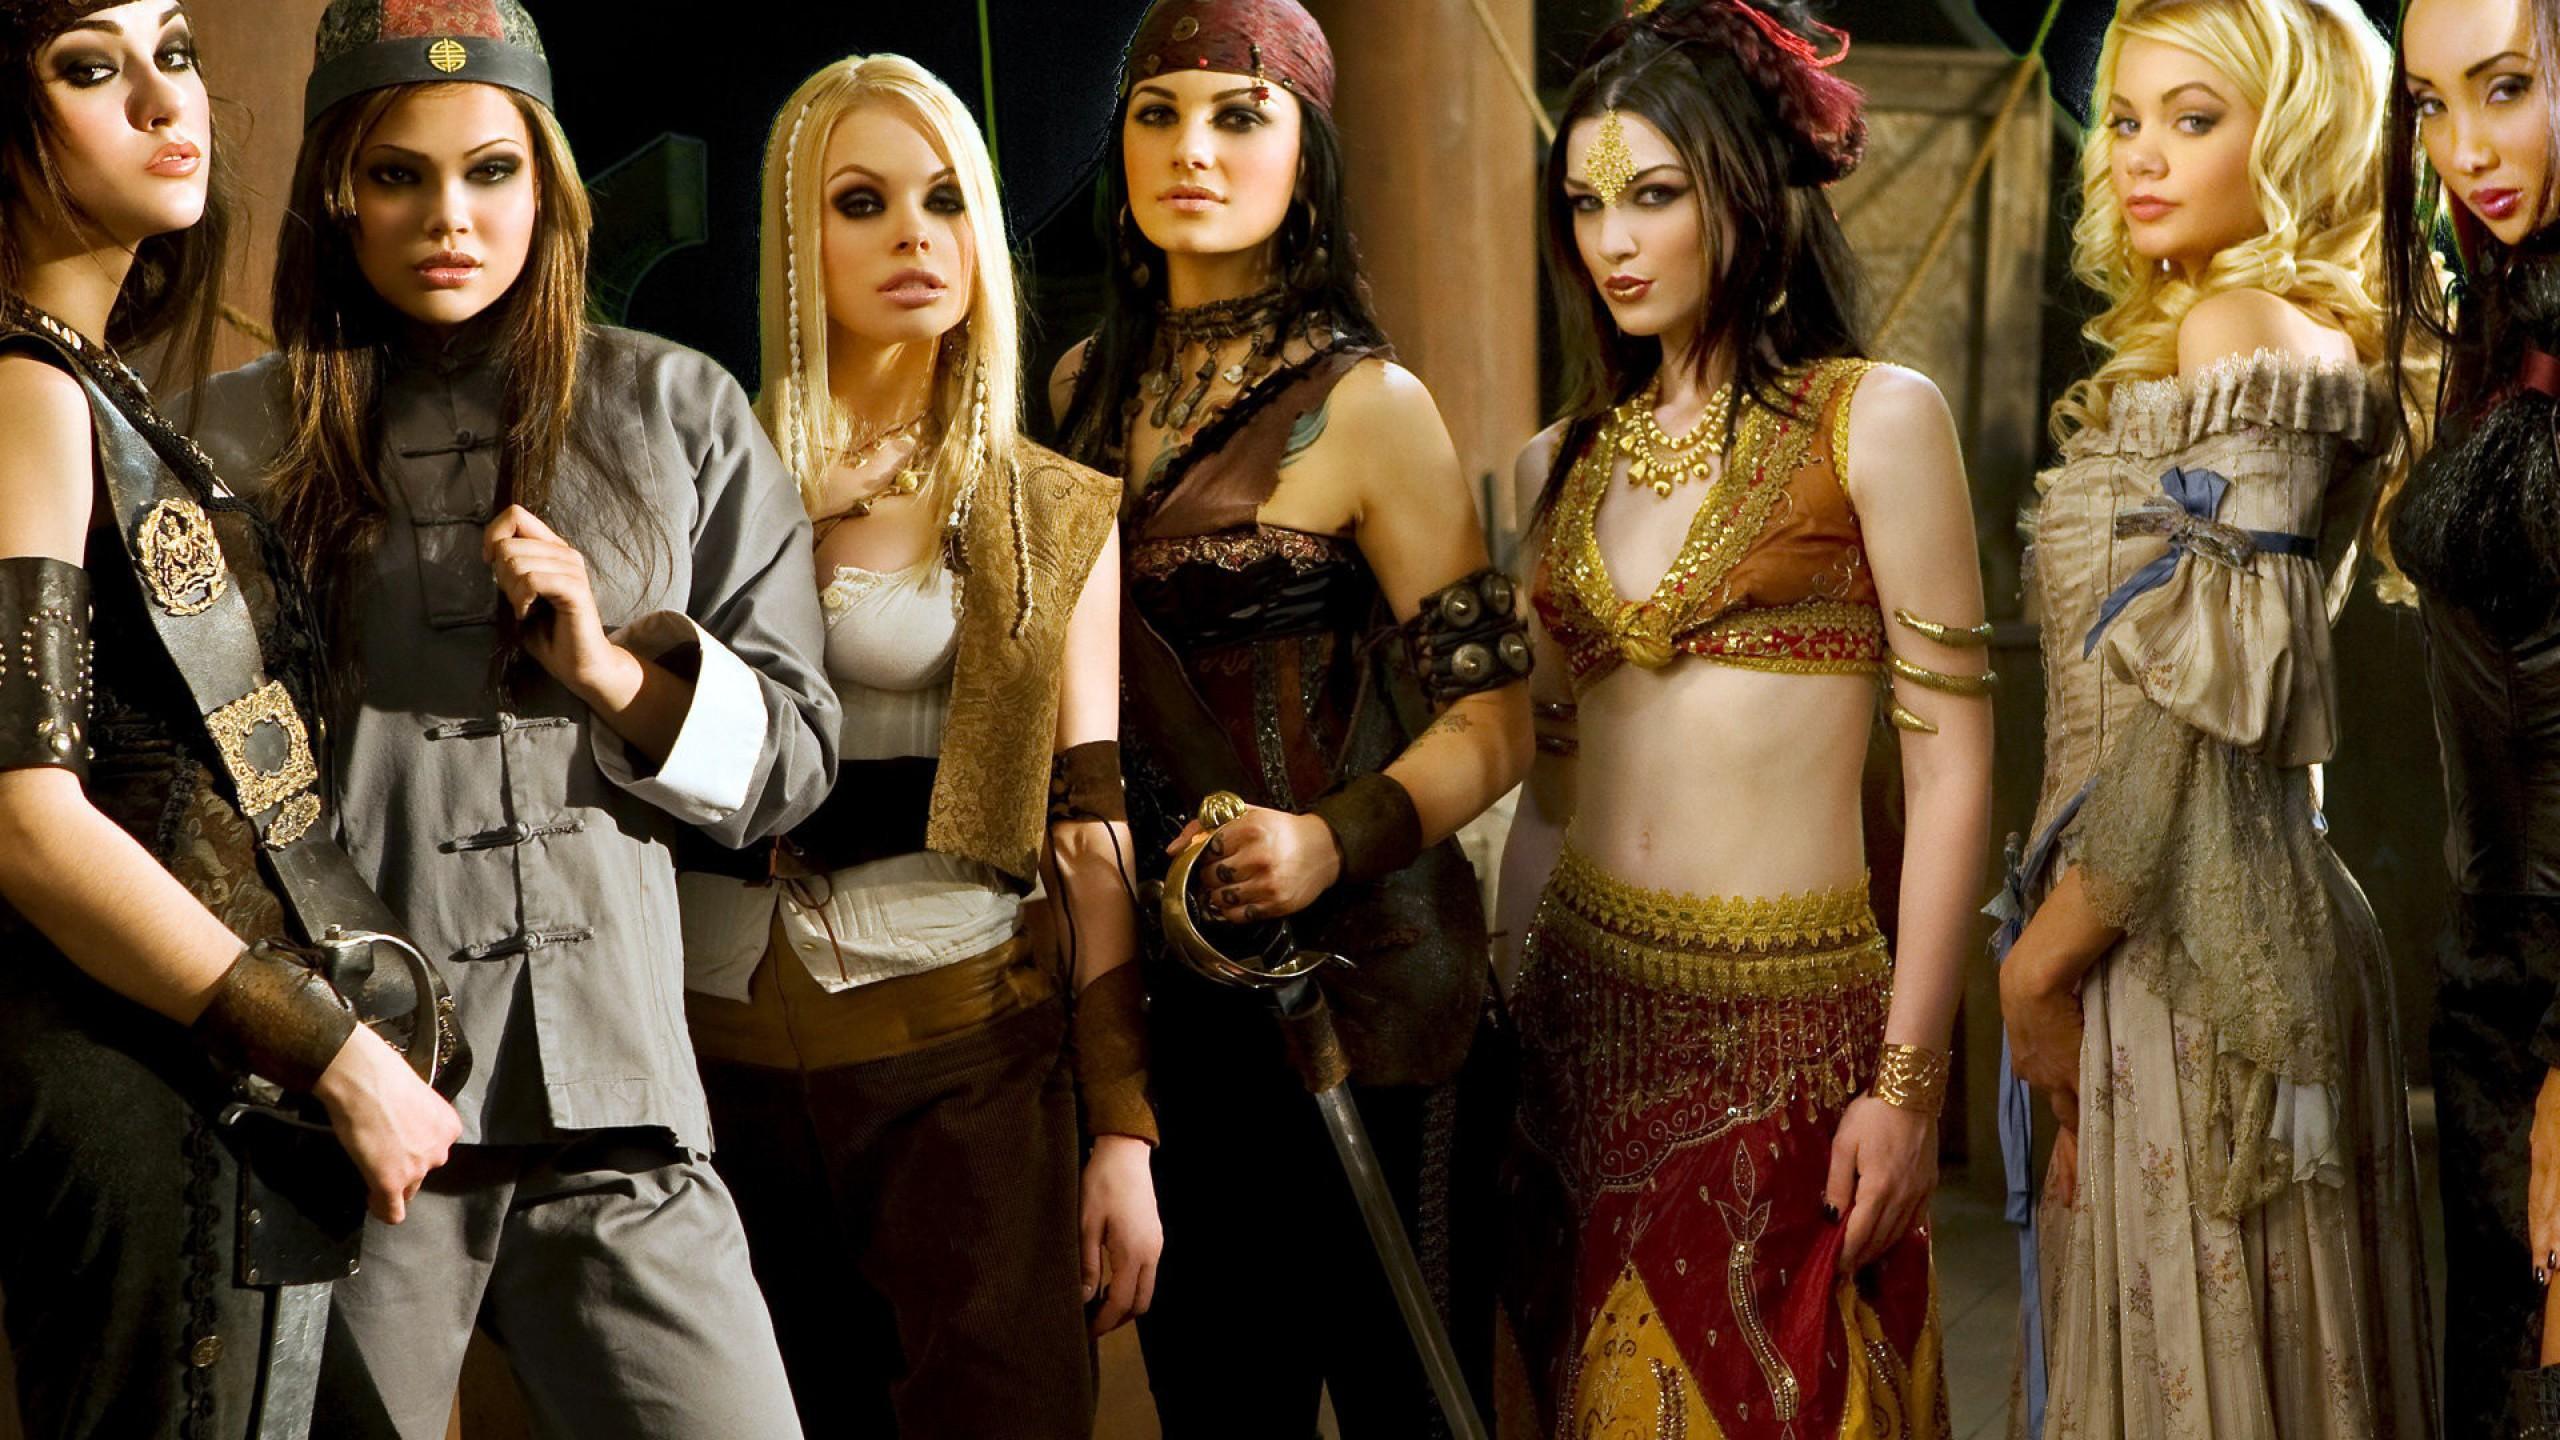 Pirates 2 stagnettis revenge scenes